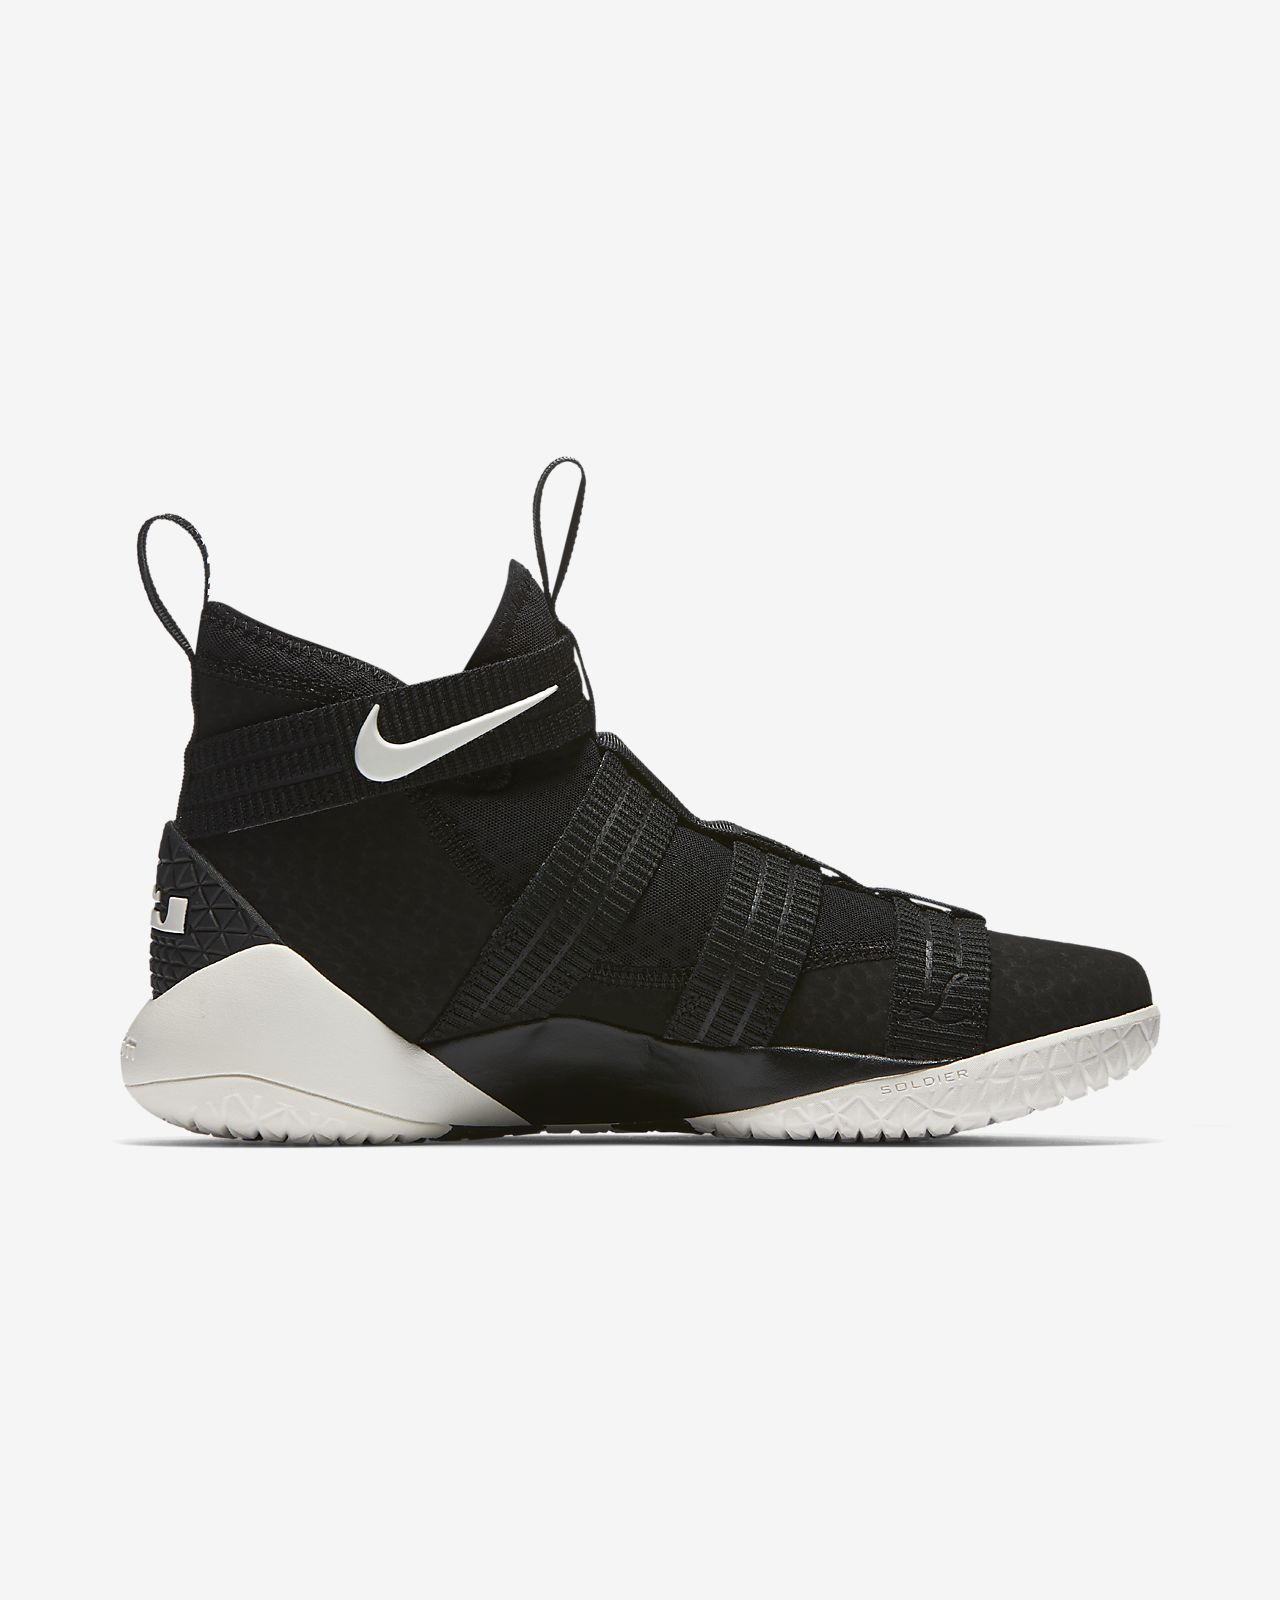 168584b5e94 LeBron Soldier XI SFG Basketball Shoe. Nike.com SG